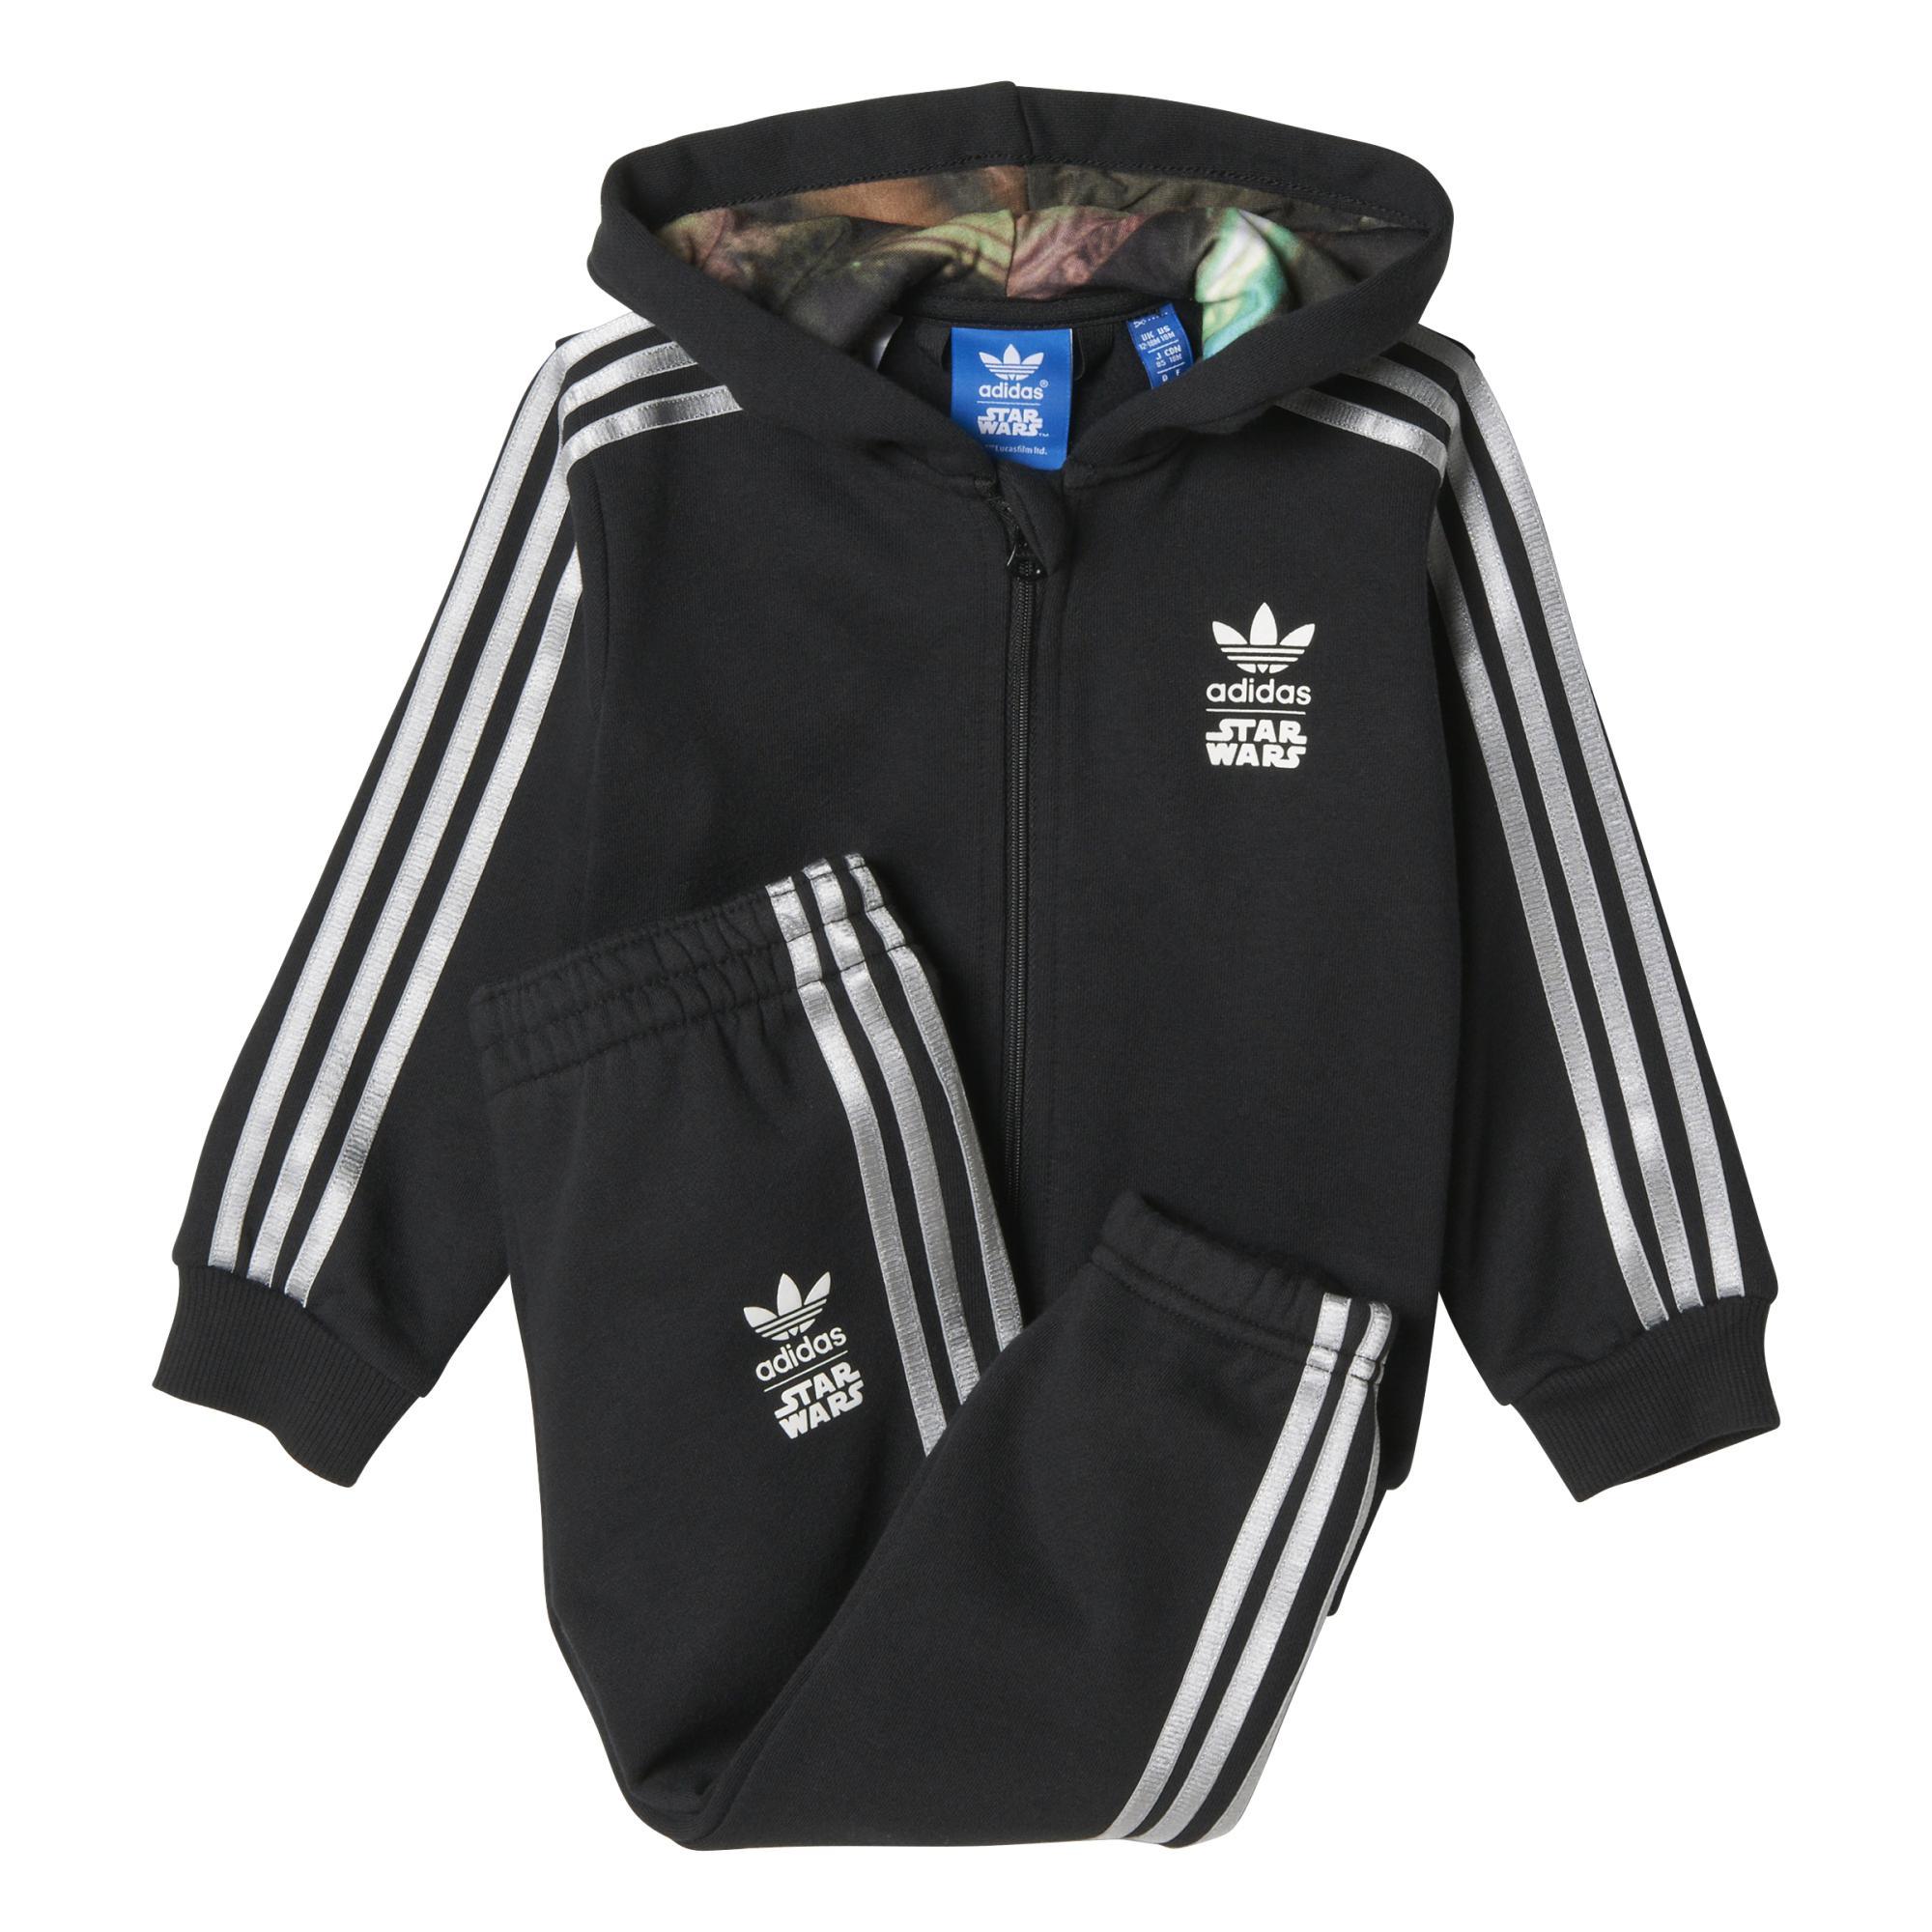 Adidas Originals Chándal Star Wars Millennium Falcon Infant